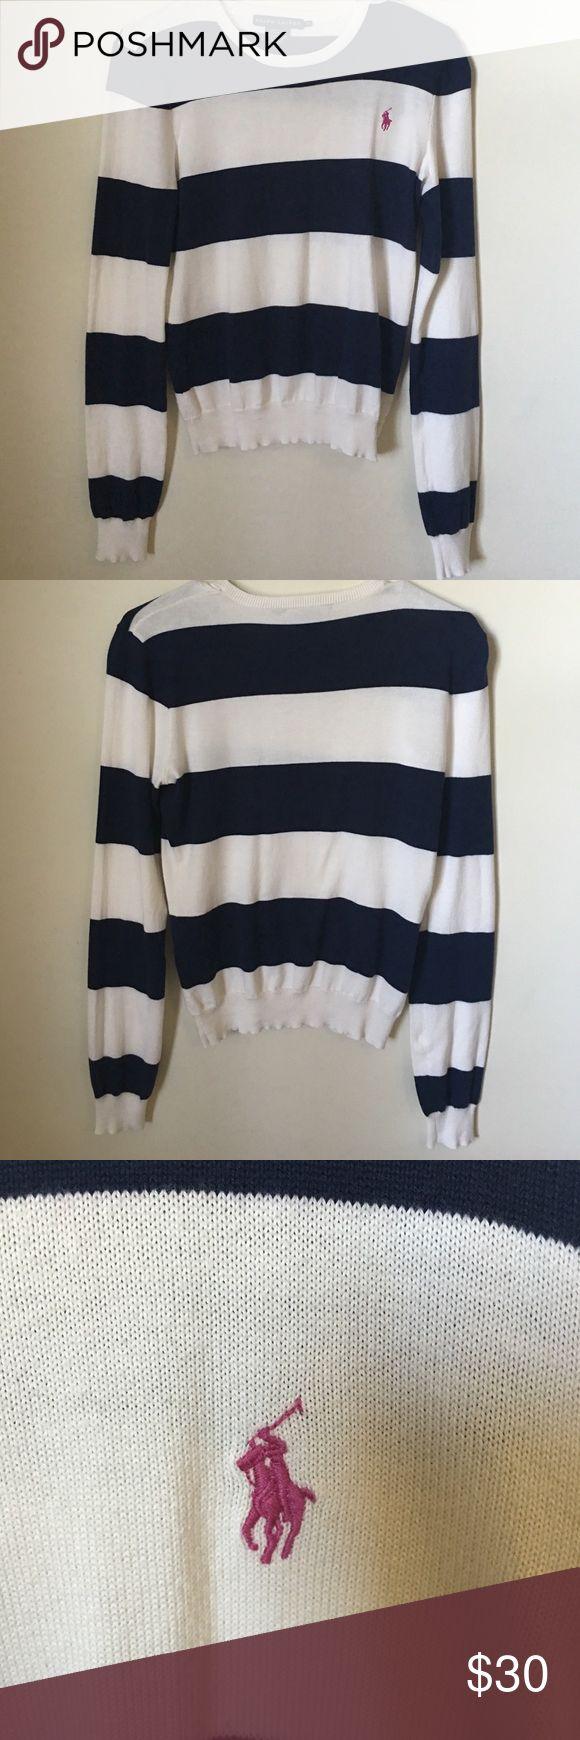 Selling this Women's Ralph Lauren Sweater on Poshmark! My username is: rossm1992. #shopmycloset #poshmark #fashion #shopping #style #forsale #Ralph Lauren #Tops